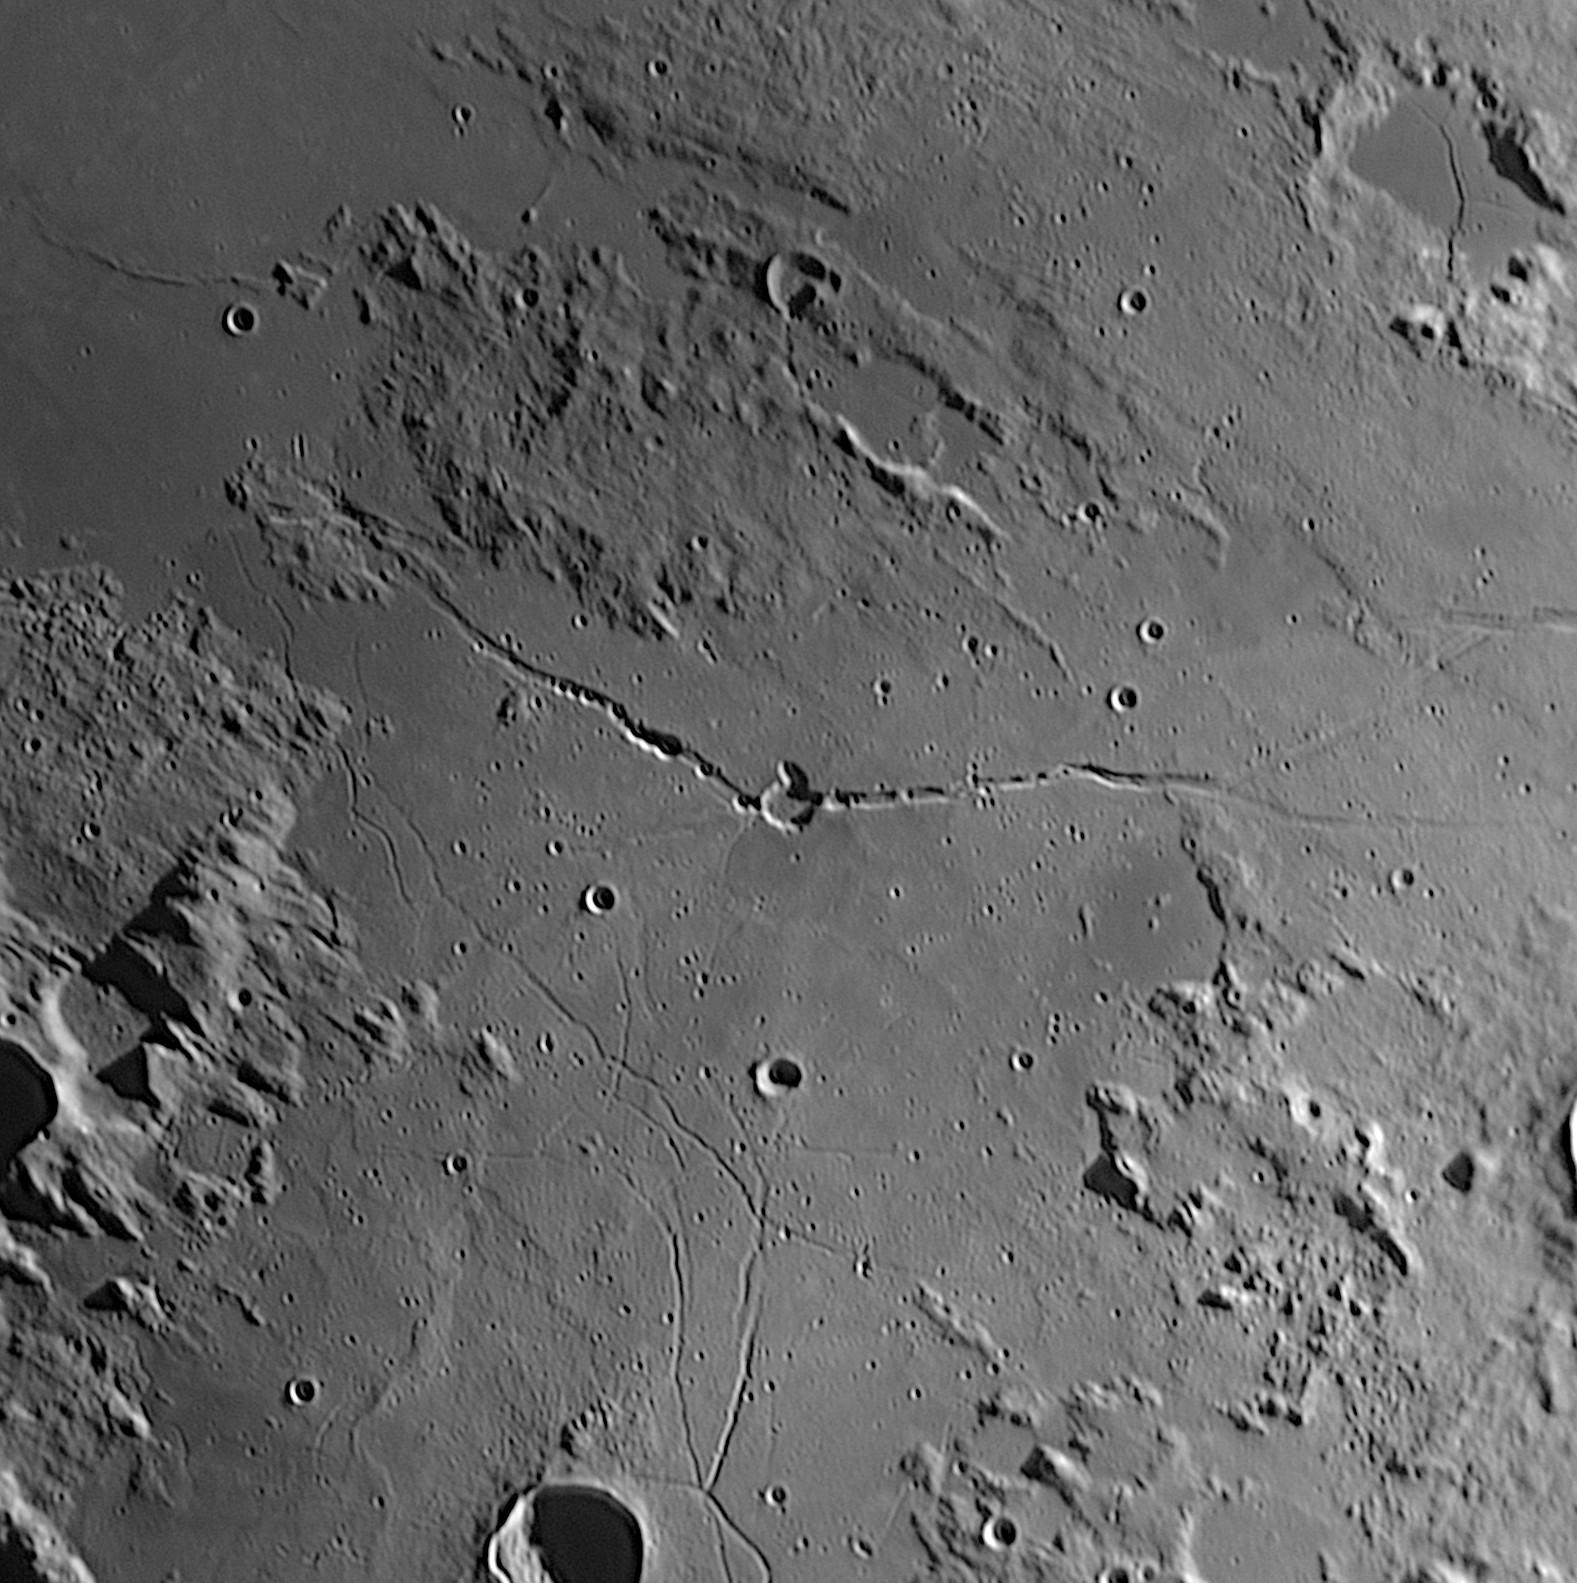 Moon_20190412_210656_23A.jpg